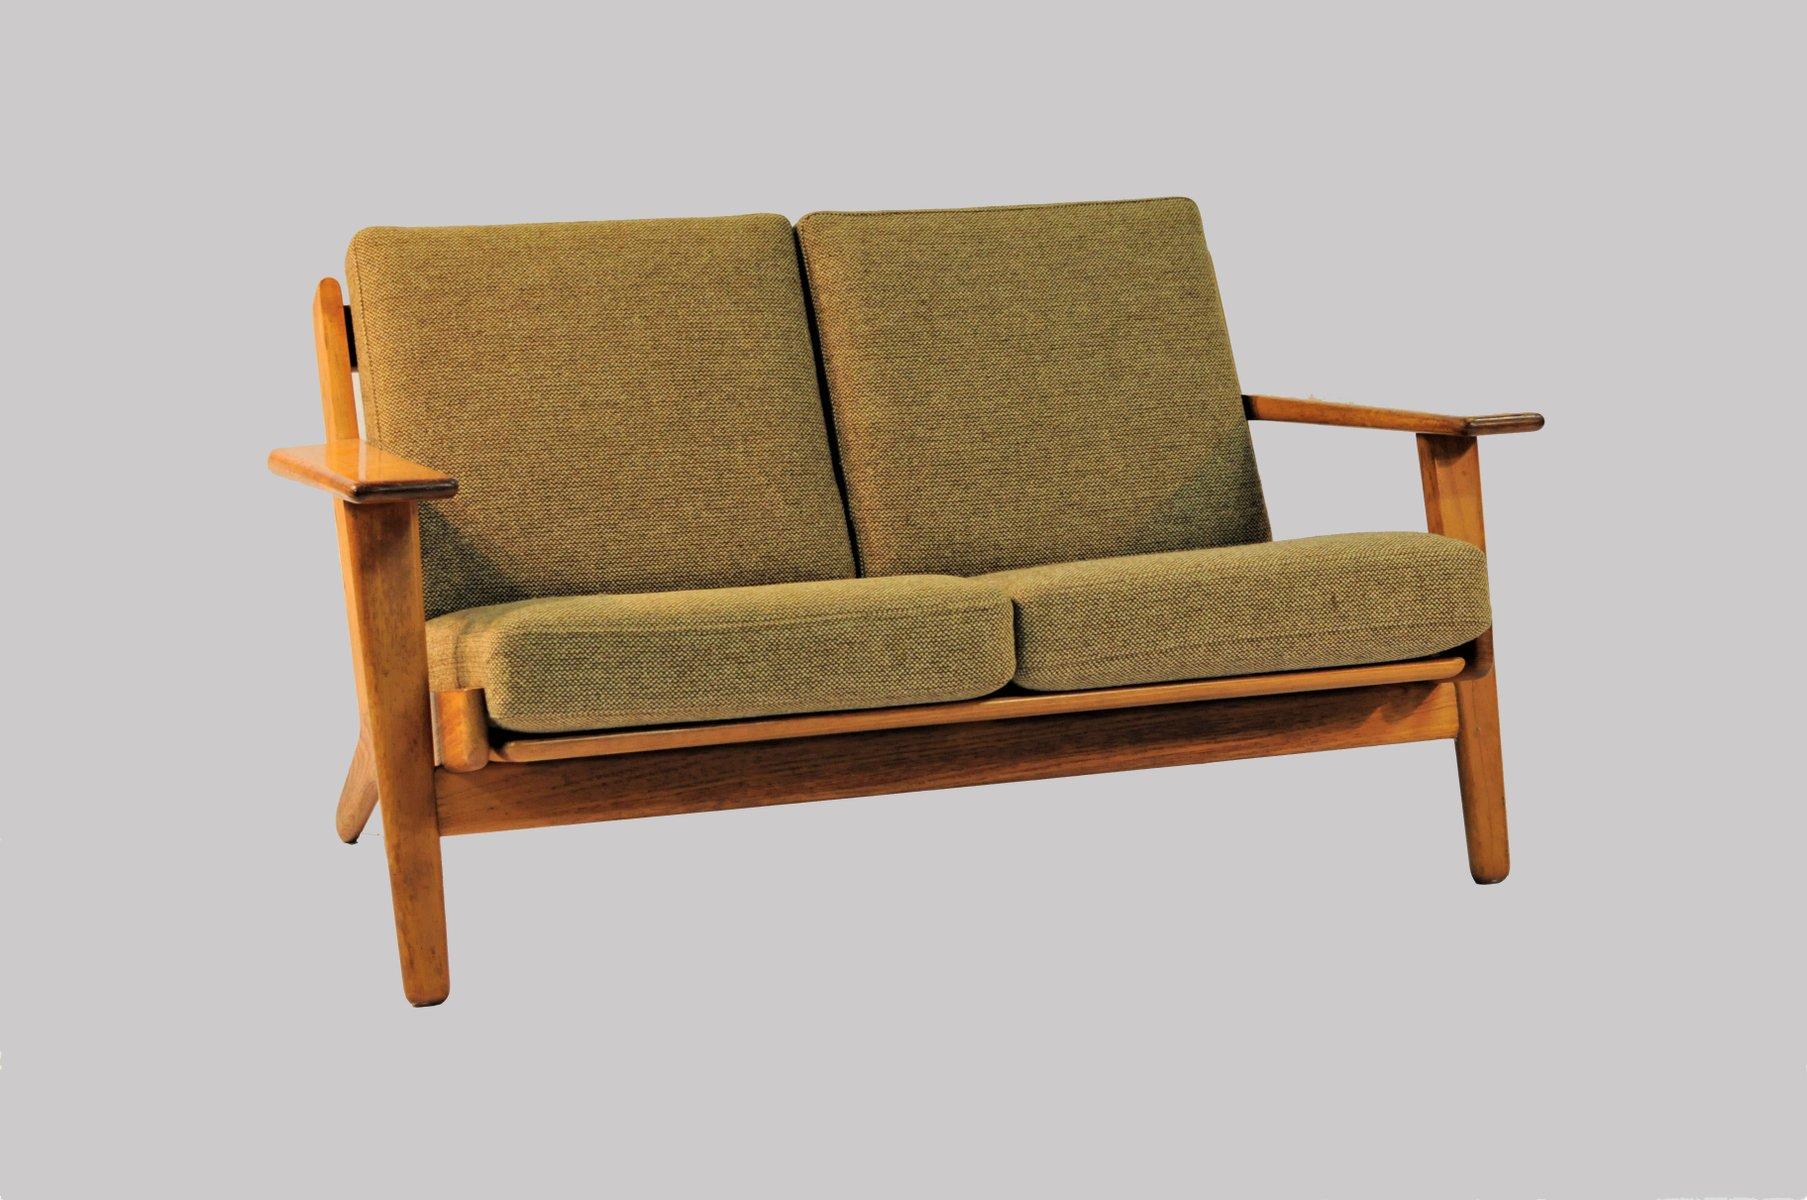 modell ge 290 2 sofa von hans j wegner f r getama 1950er bei pamono kaufen. Black Bedroom Furniture Sets. Home Design Ideas